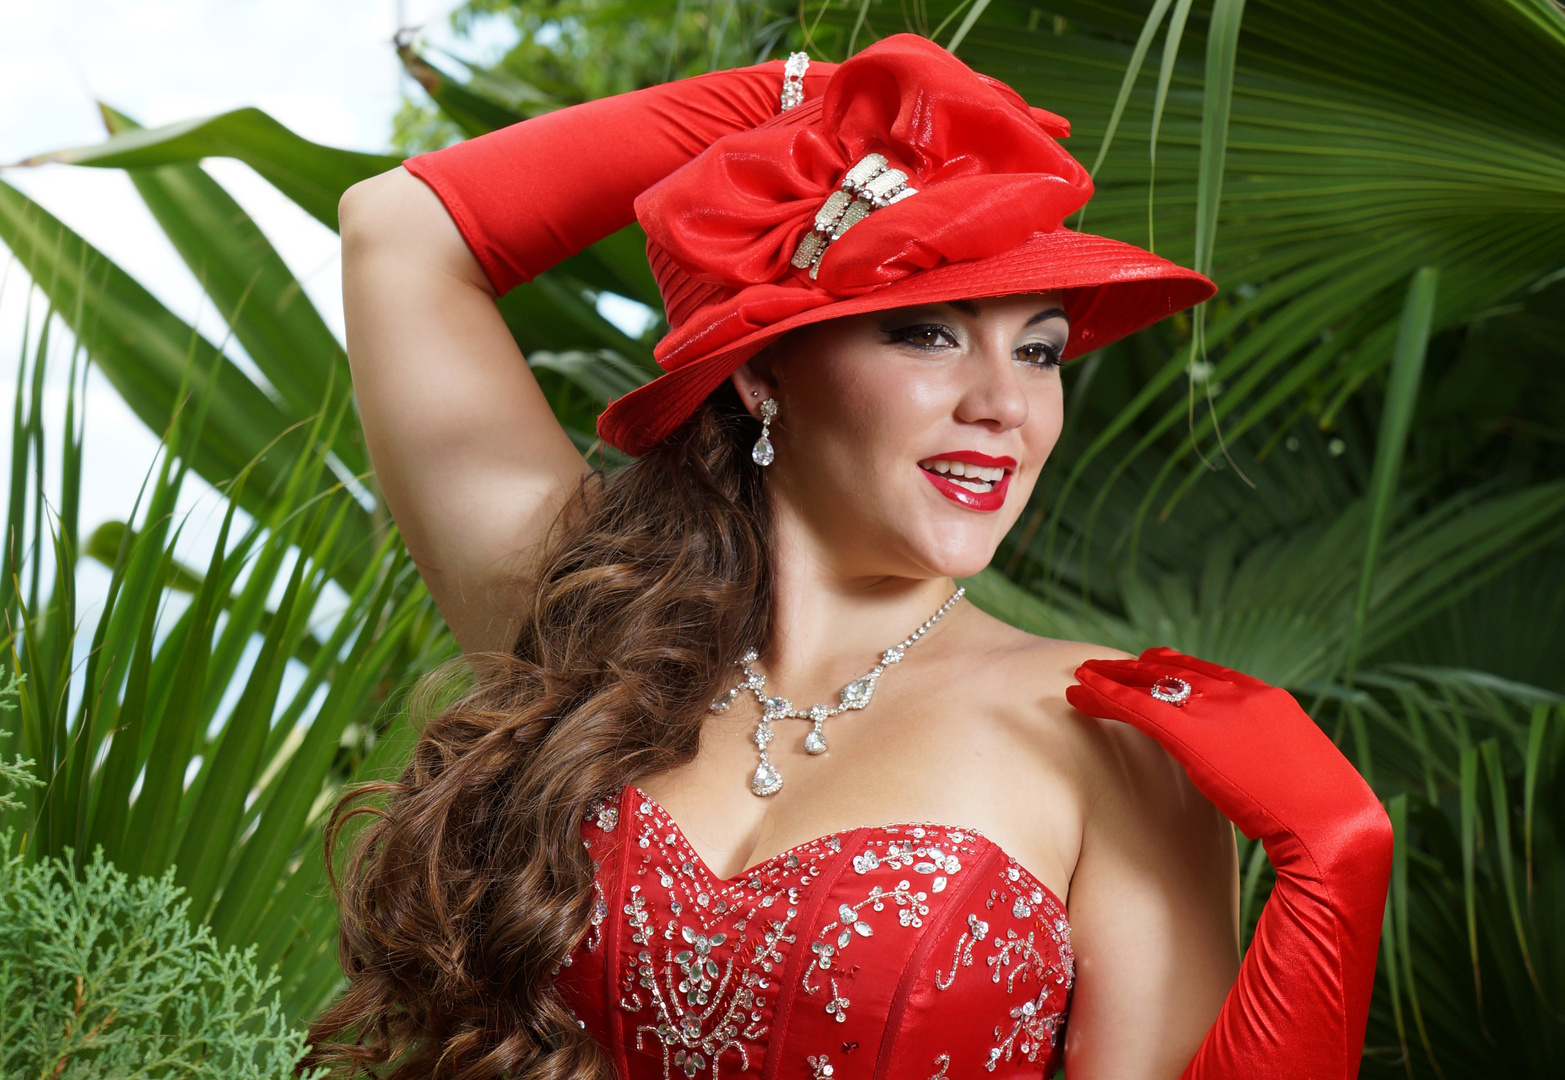 Frau in Rot 7